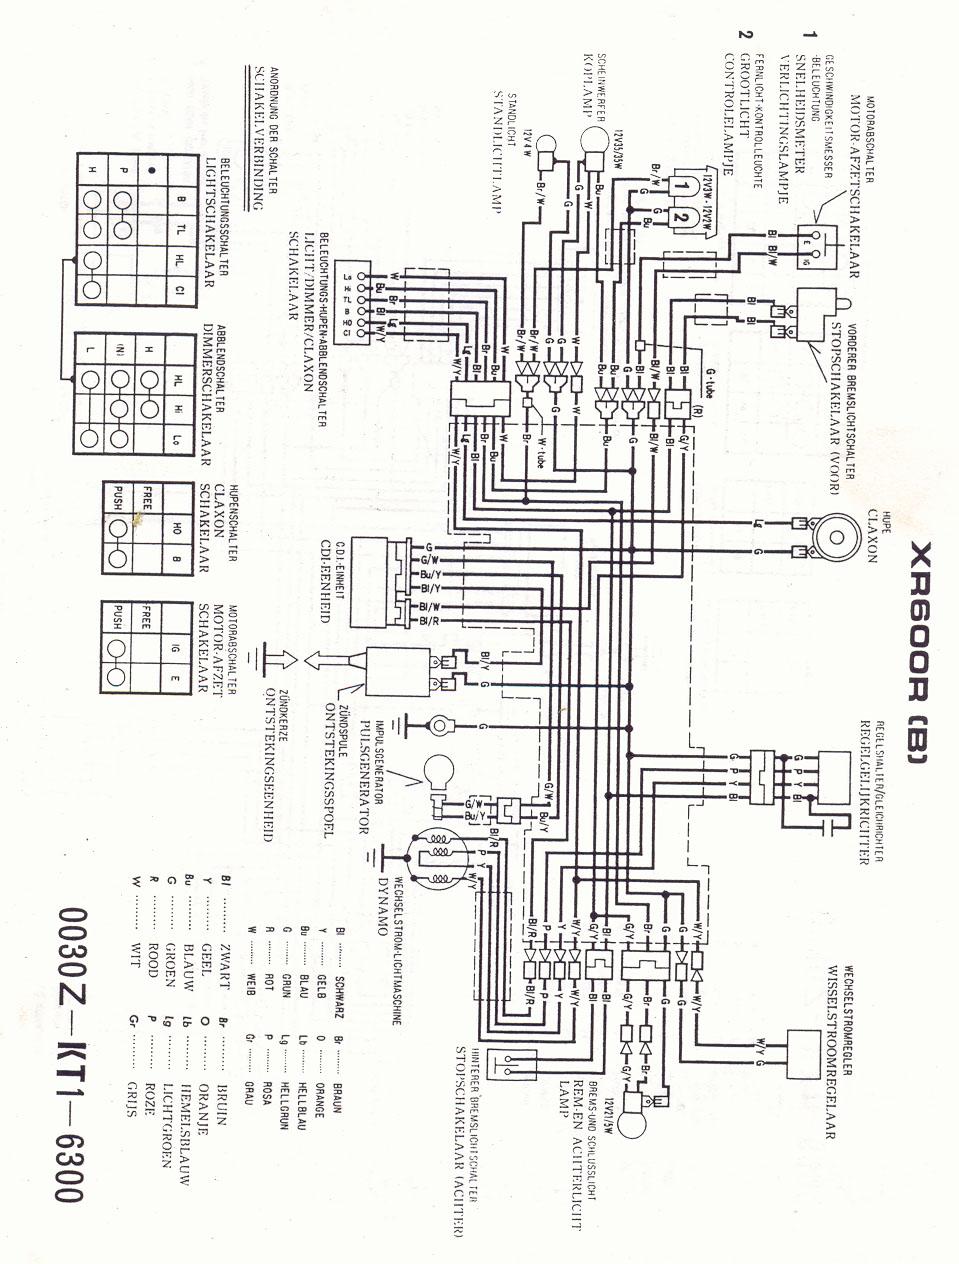 hight resolution of xl600r wiring diagram wiring diagram 1986 honda xl600r wiring diagram honda xl600r wiring diagram